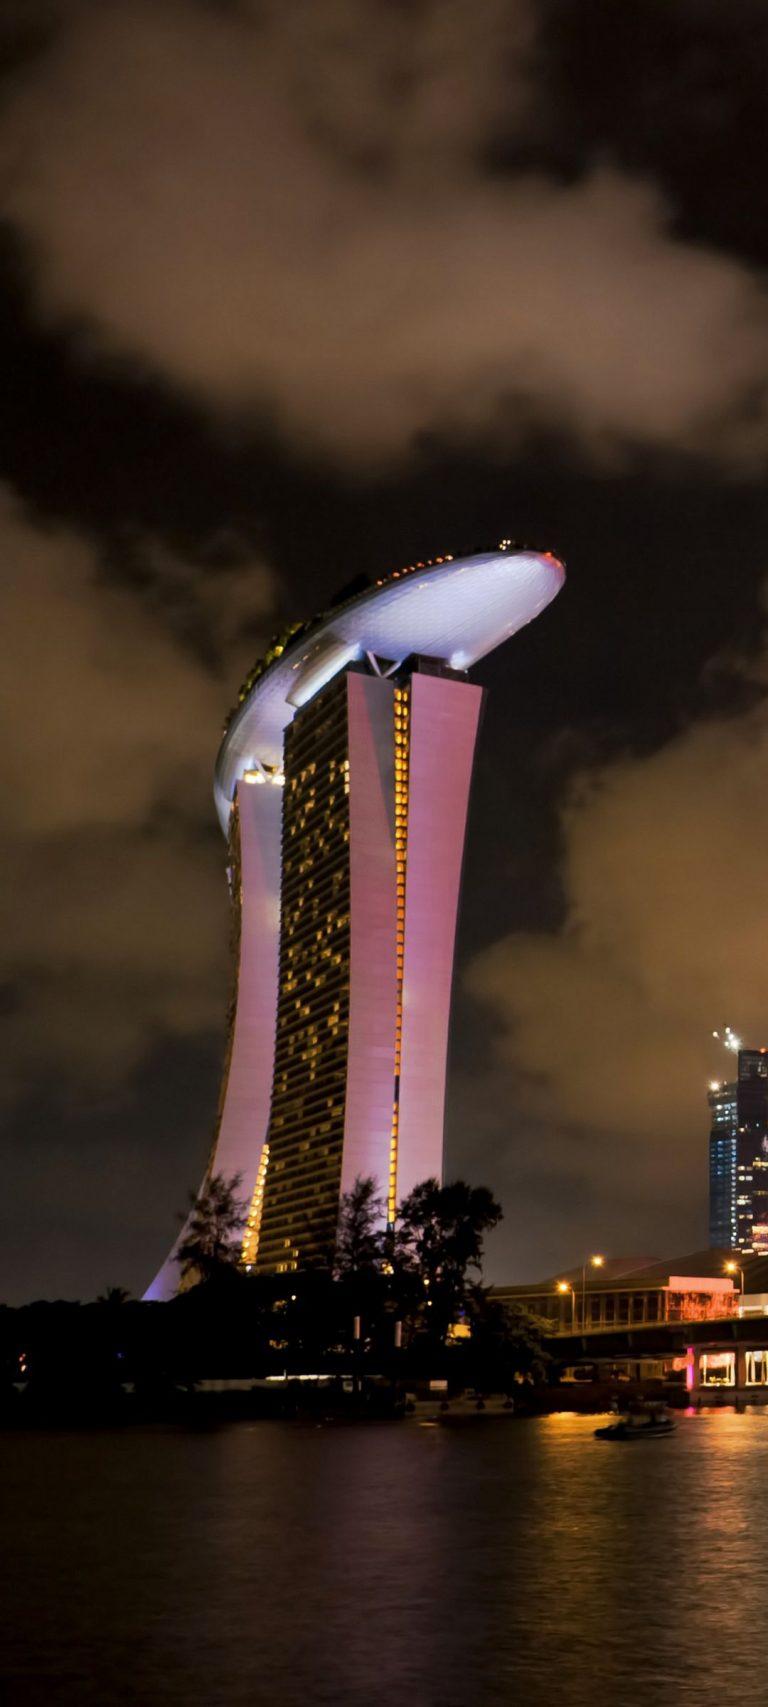 Singapore Holiday Fireworks Bridge 1080x2400 768x1707